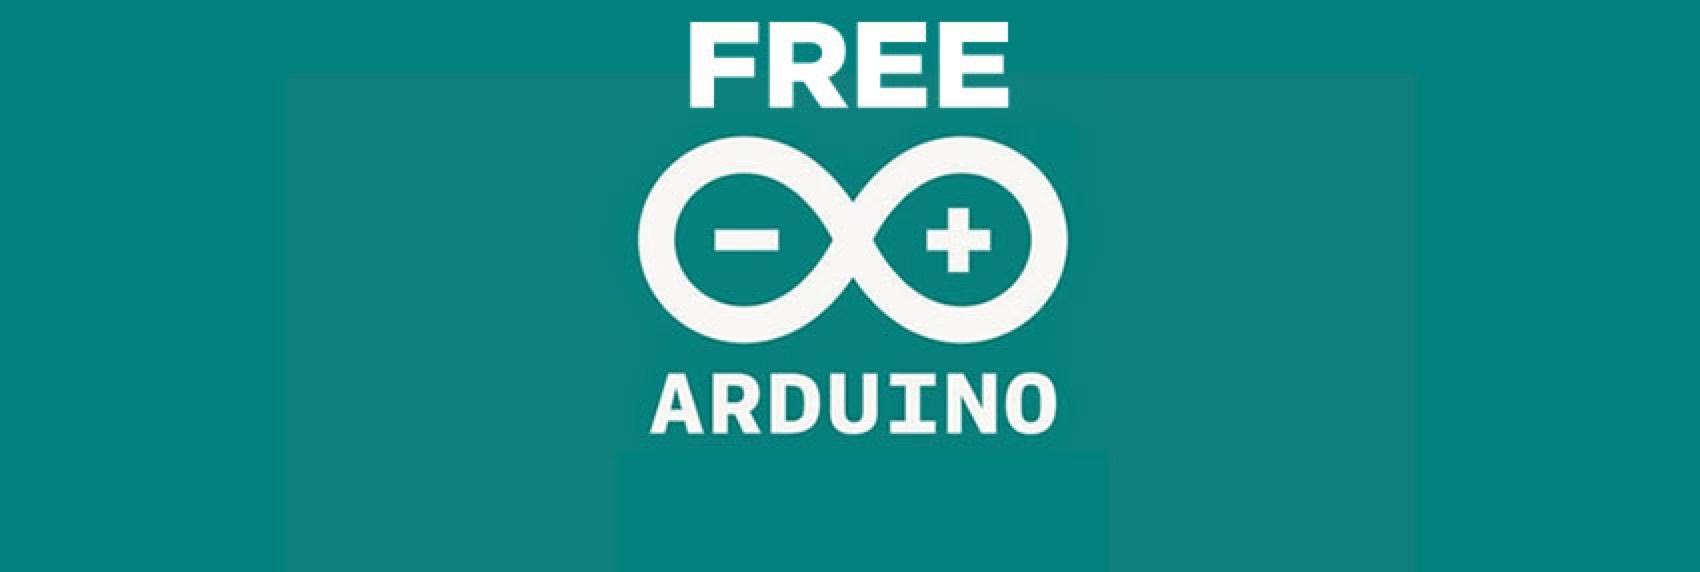 Freearduino